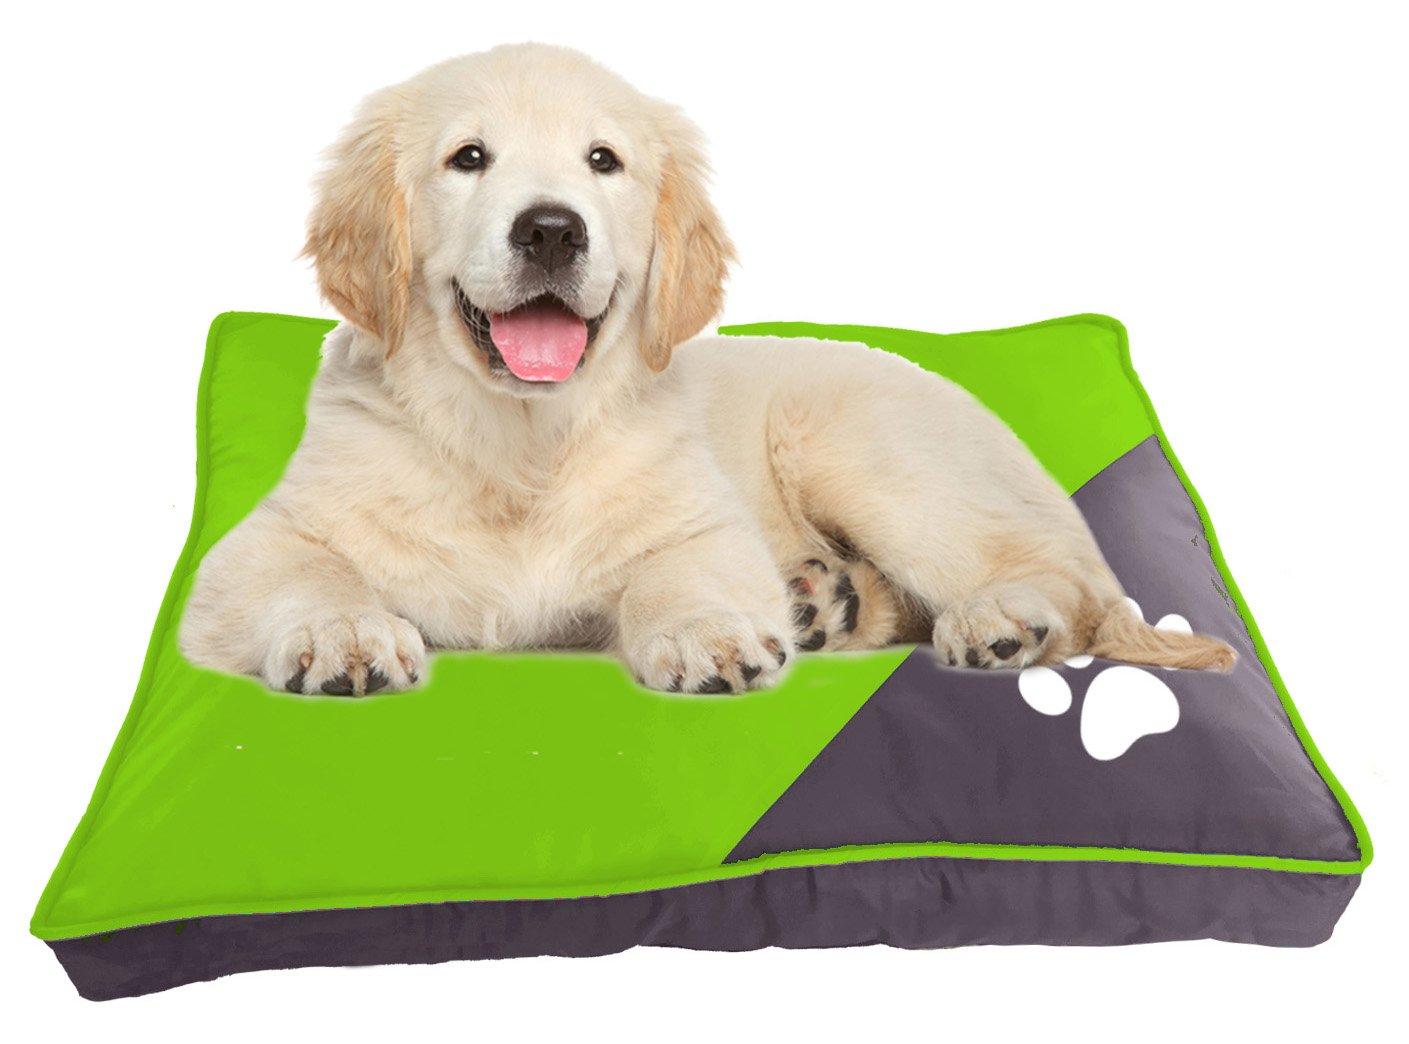 L, Fucsia BPS R BPS Colchoneta Cuna para Perros Mascotas Cama de Verano Colch/ón Manta Sof/á Suave con Material Tela Oxford Varios Colores y 2 Medidas para Elegir